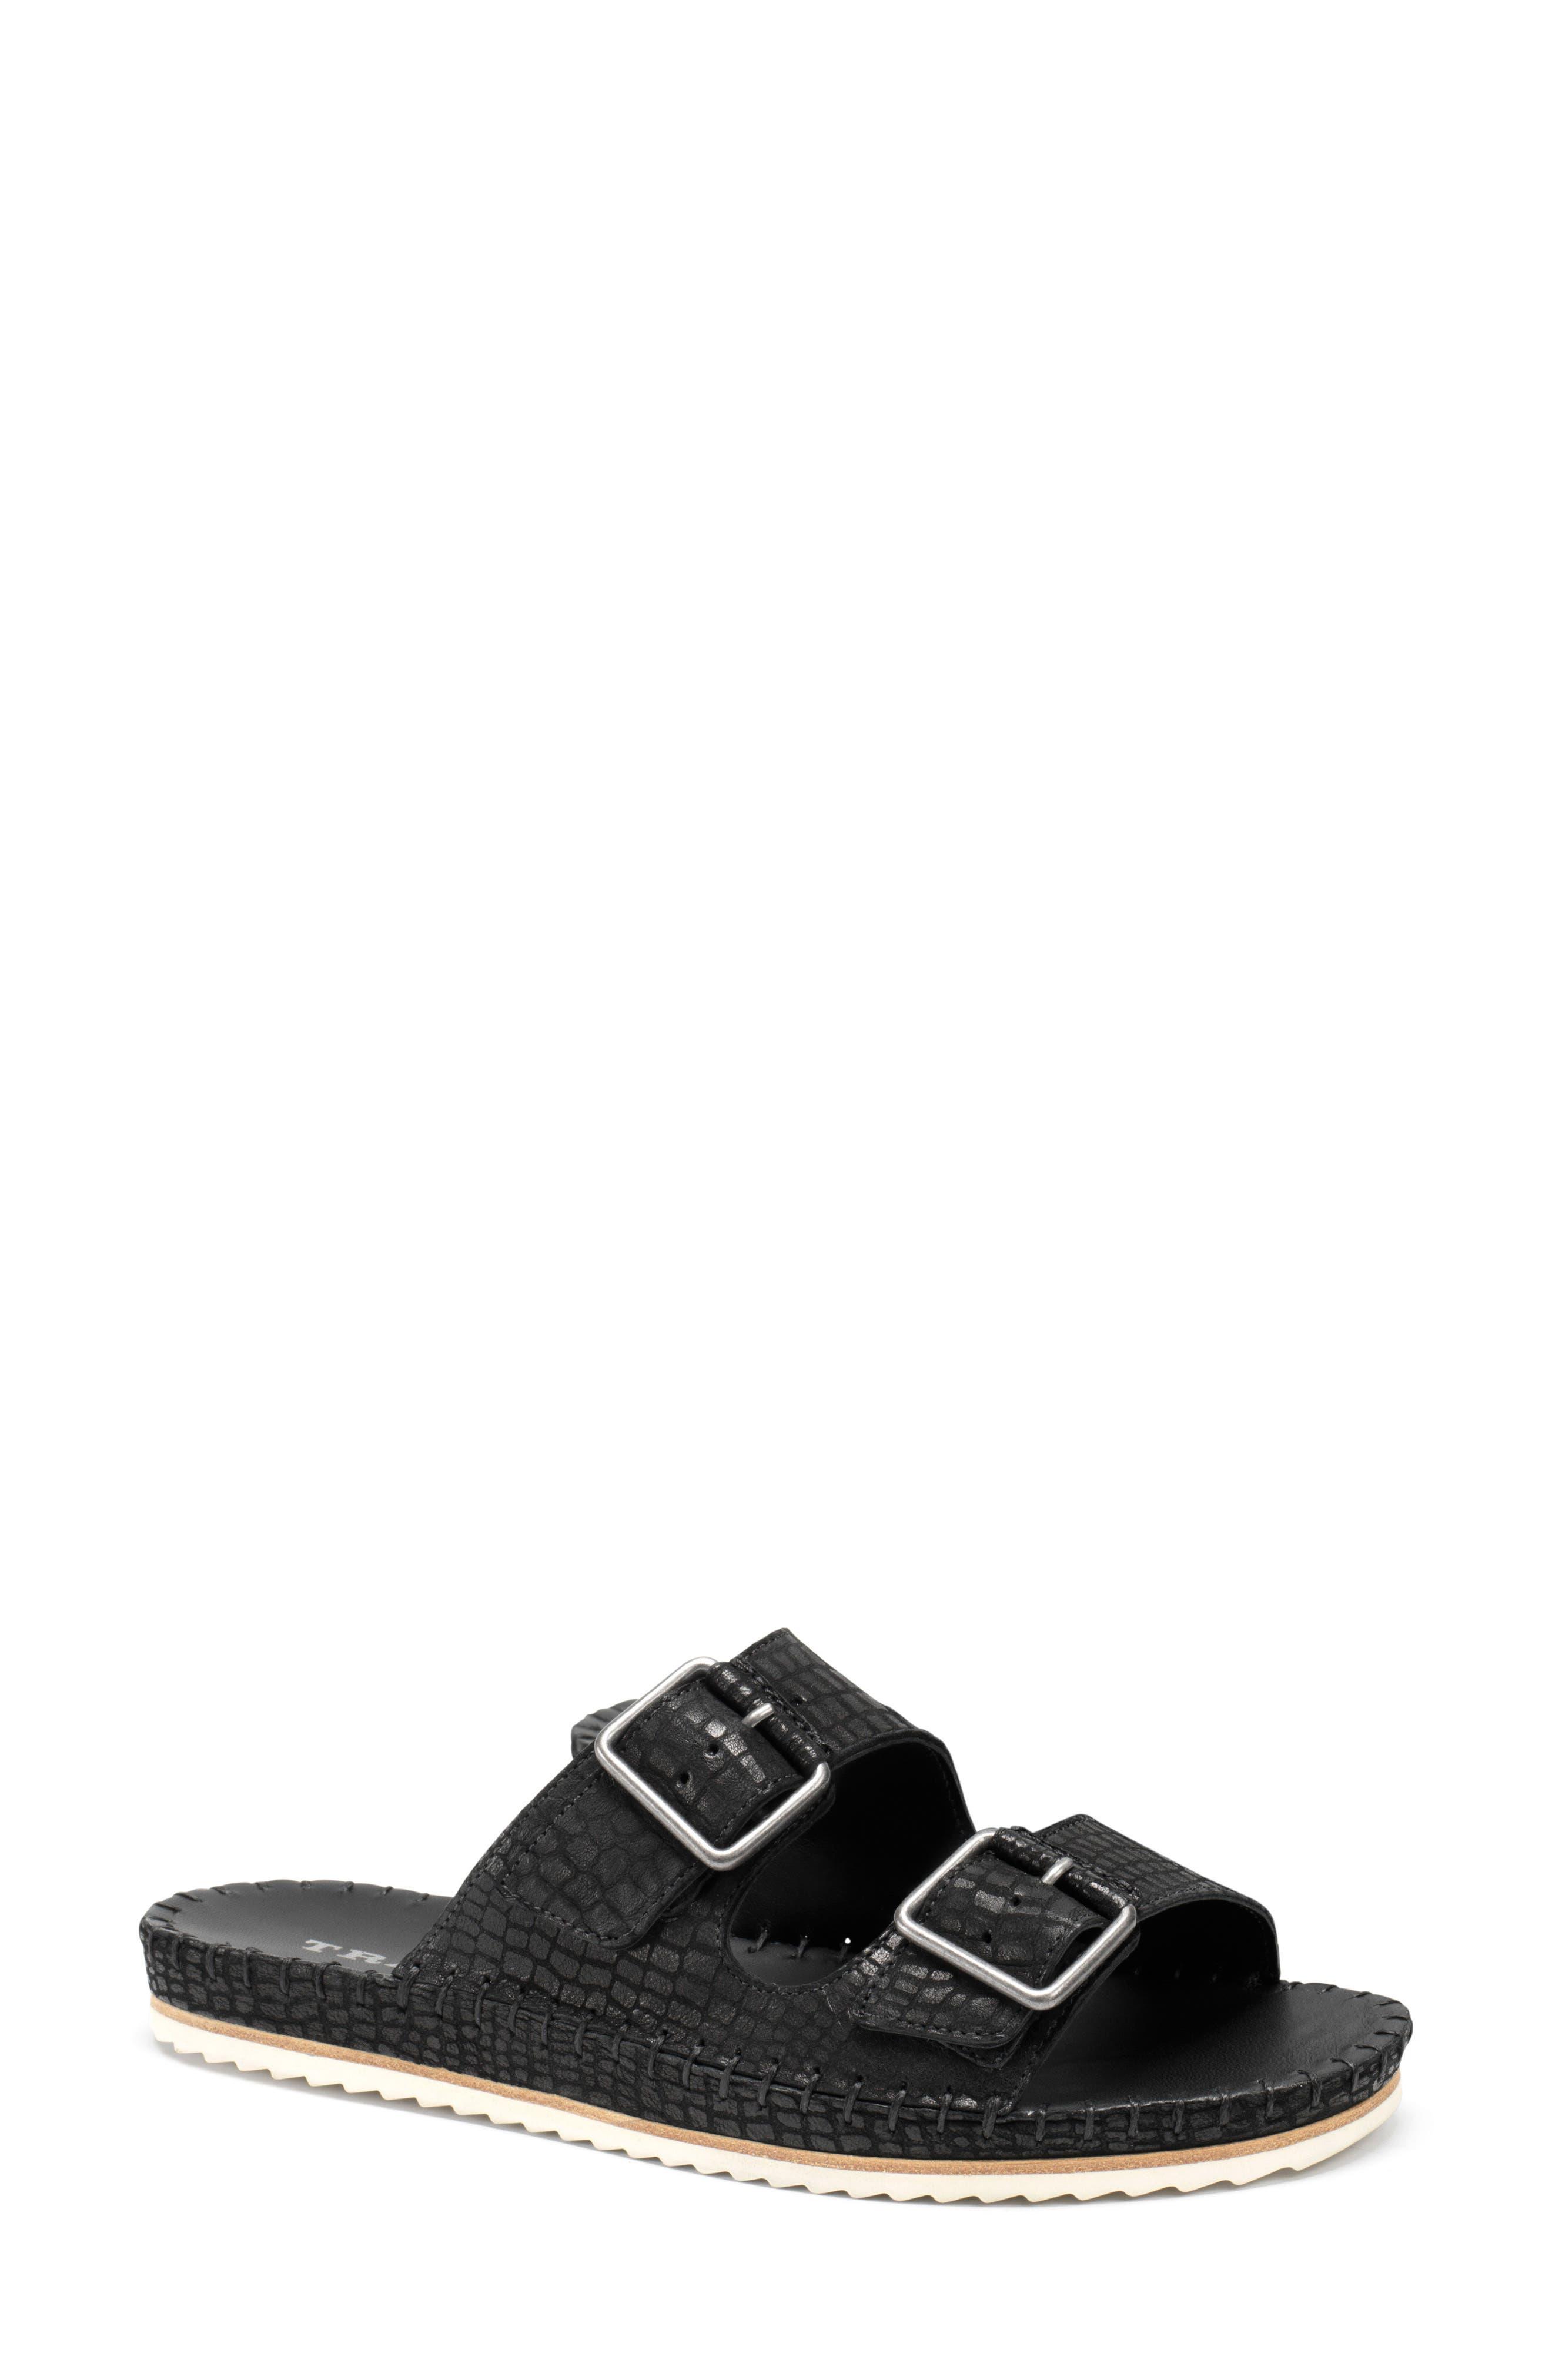 Carli Slide Sandal,                             Main thumbnail 1, color,                             BLACK EMBOSSED LEATHER